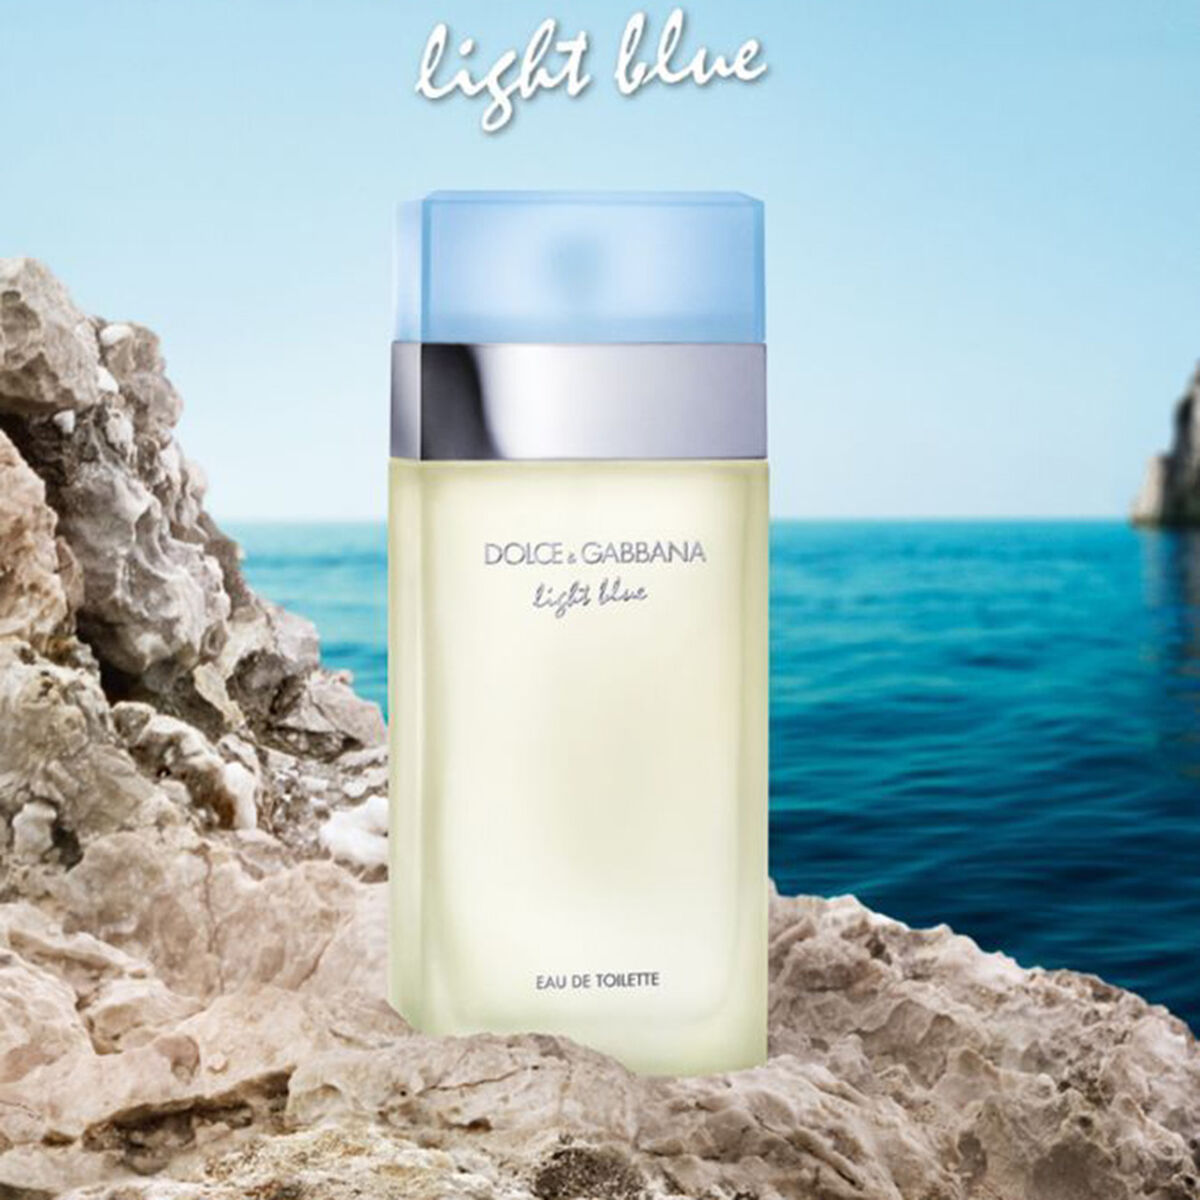 Dolce&Gabbana Light Blue EDT 25ml